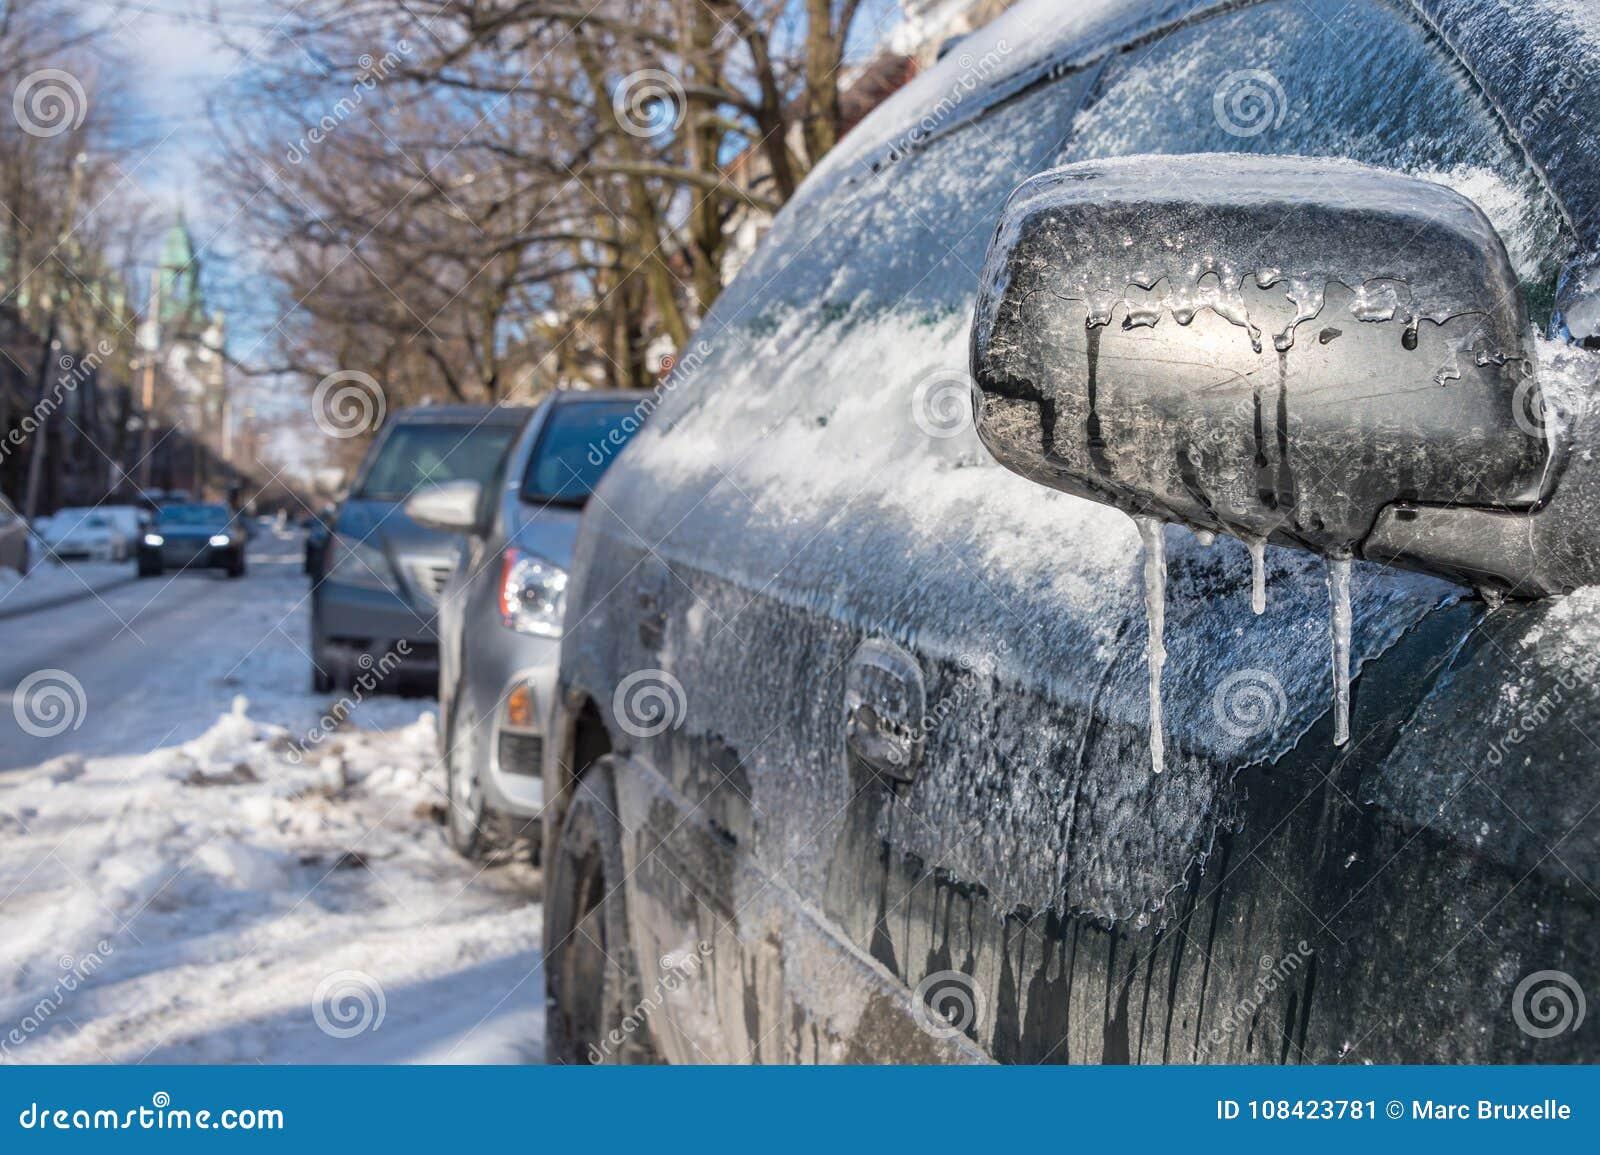 Tjockt lager av is på bilen, når att ha fryst regn